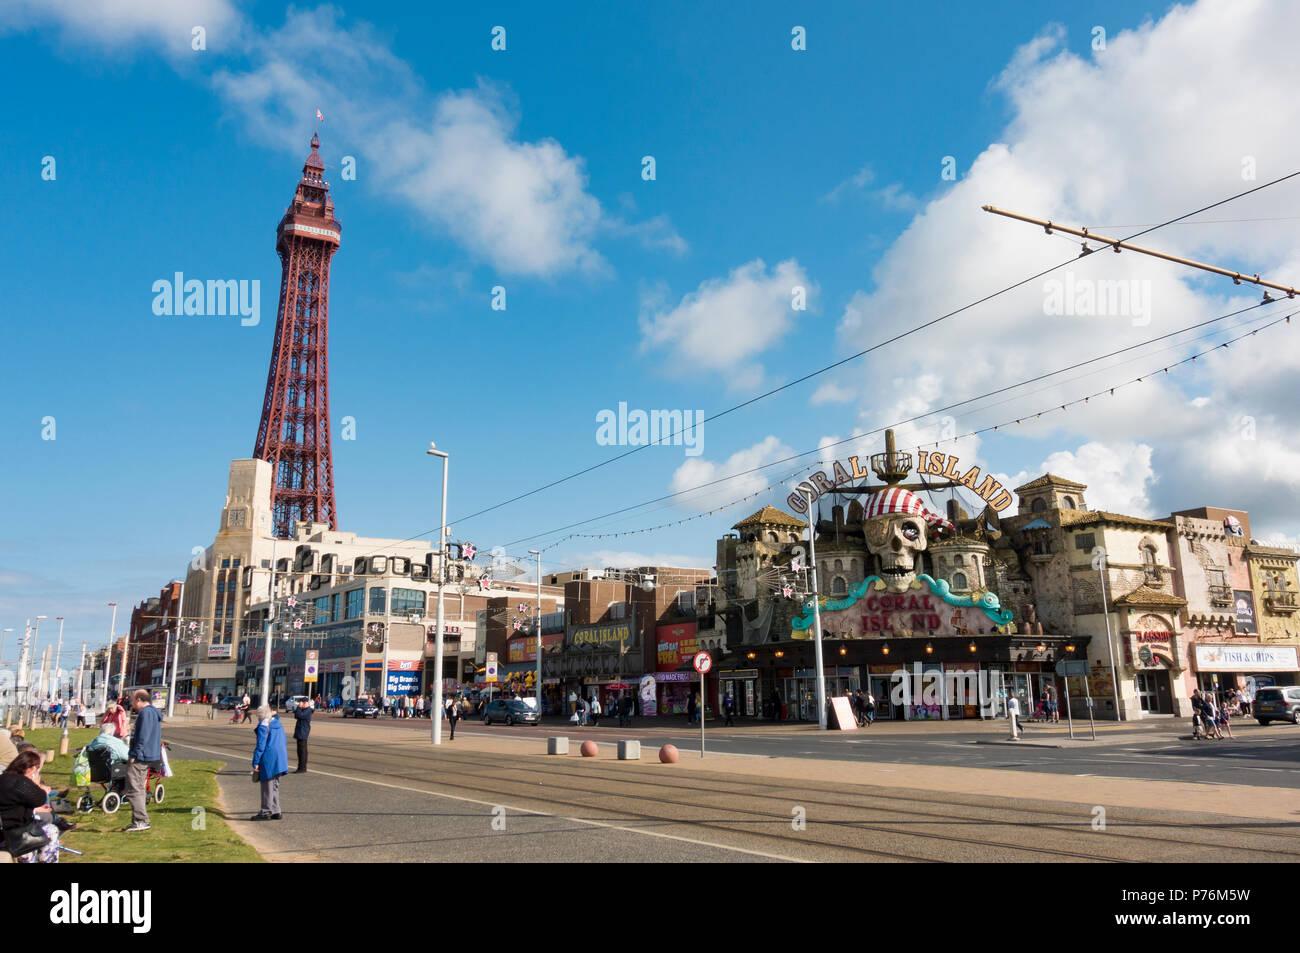 Coral Island Amusement Arcade in Blackpool - Stock Image